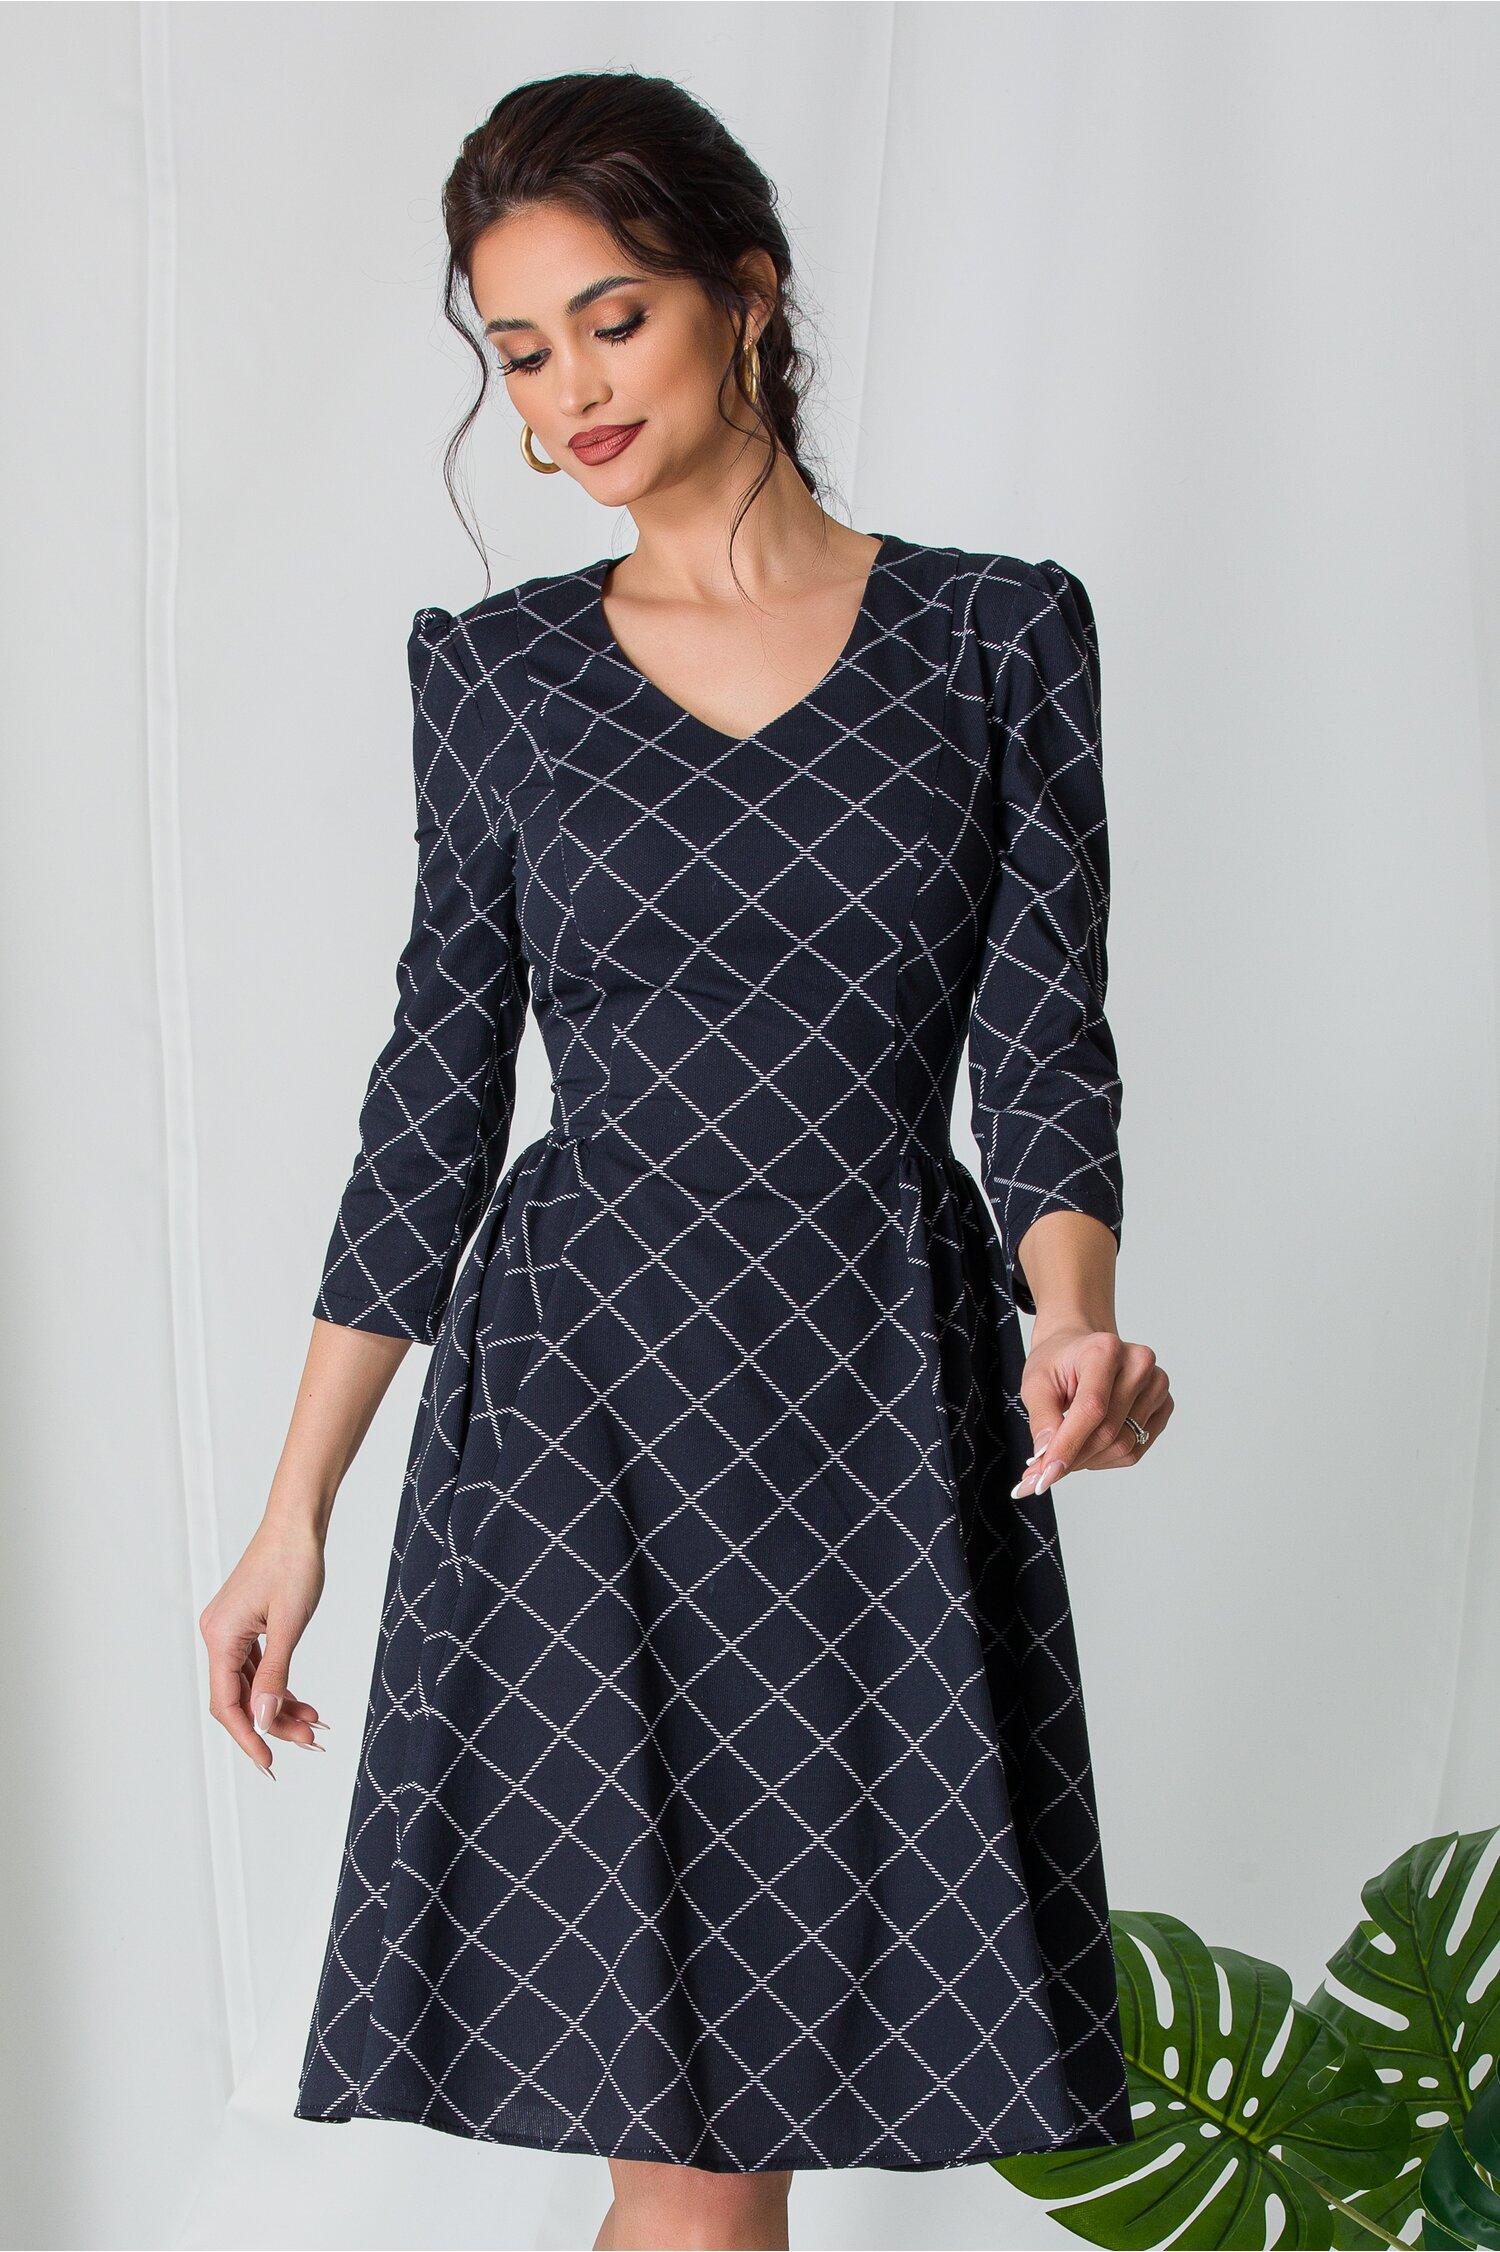 Rochie Vanda neagra cu imprimeuri geometrice